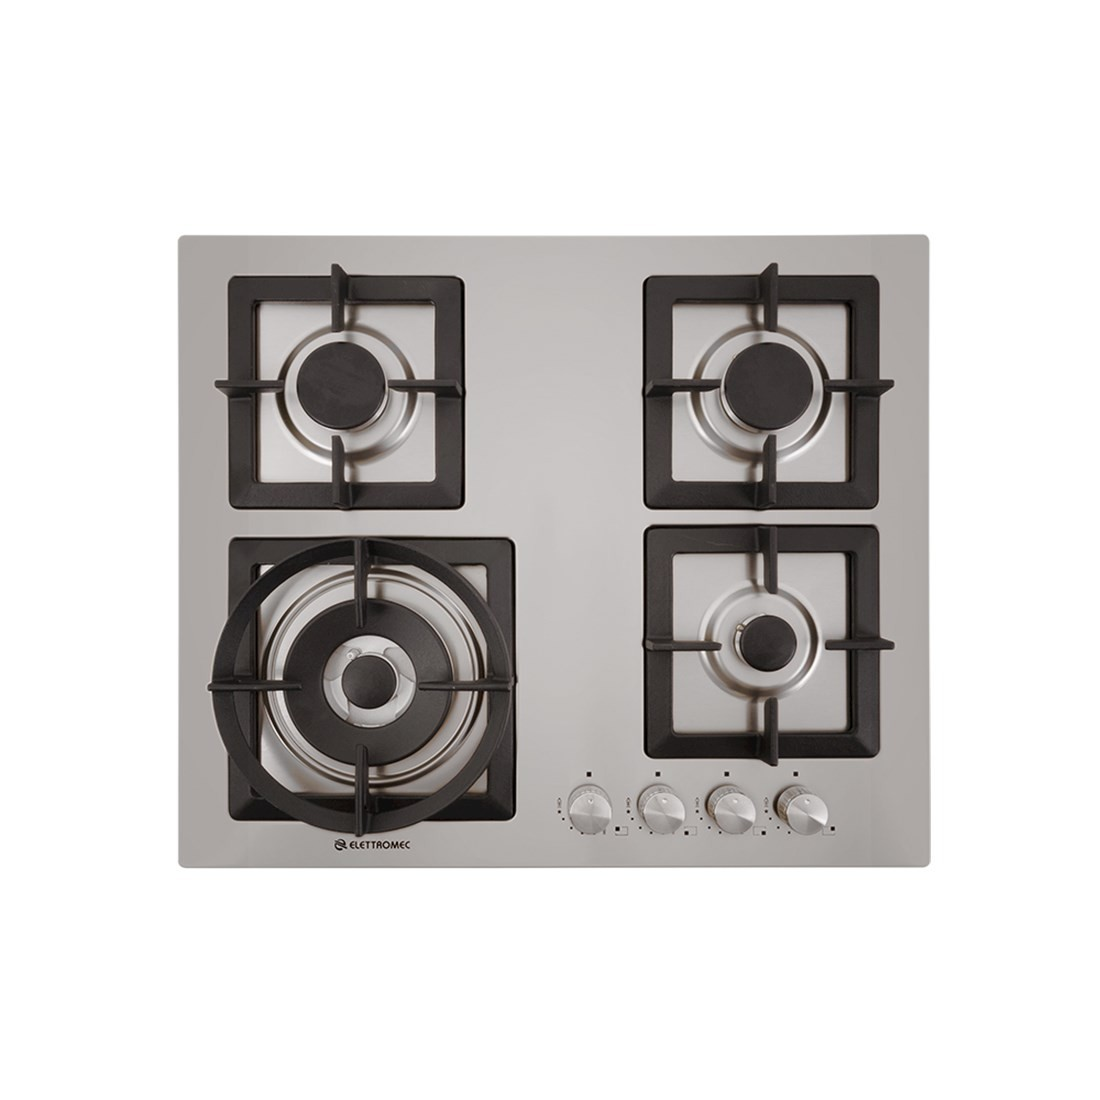 Cooktop Elettromec a Gás Quadratto 4 Bocas Tripla Chama Inox Gusa 60cm